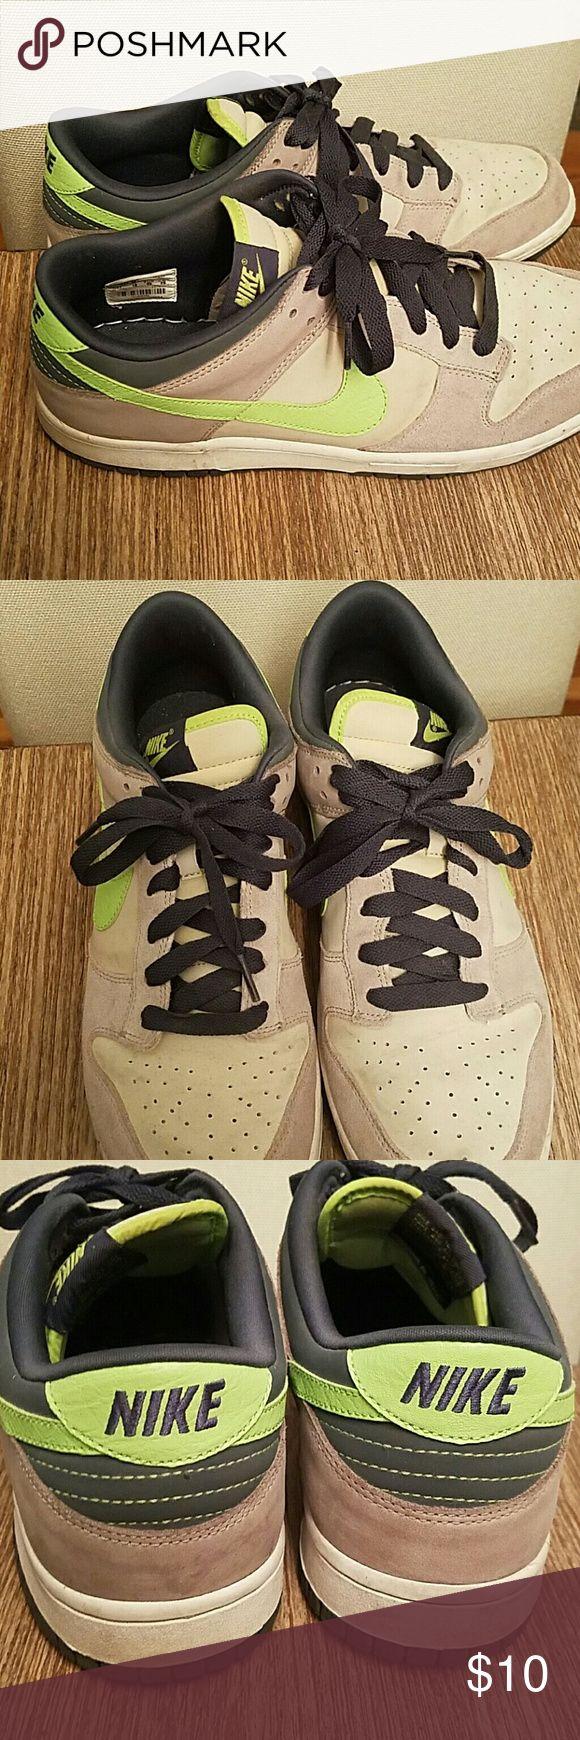 Men's Nike Custom tennis shoes Size 11 casual tennis shoes Nike Shoes Sneakers